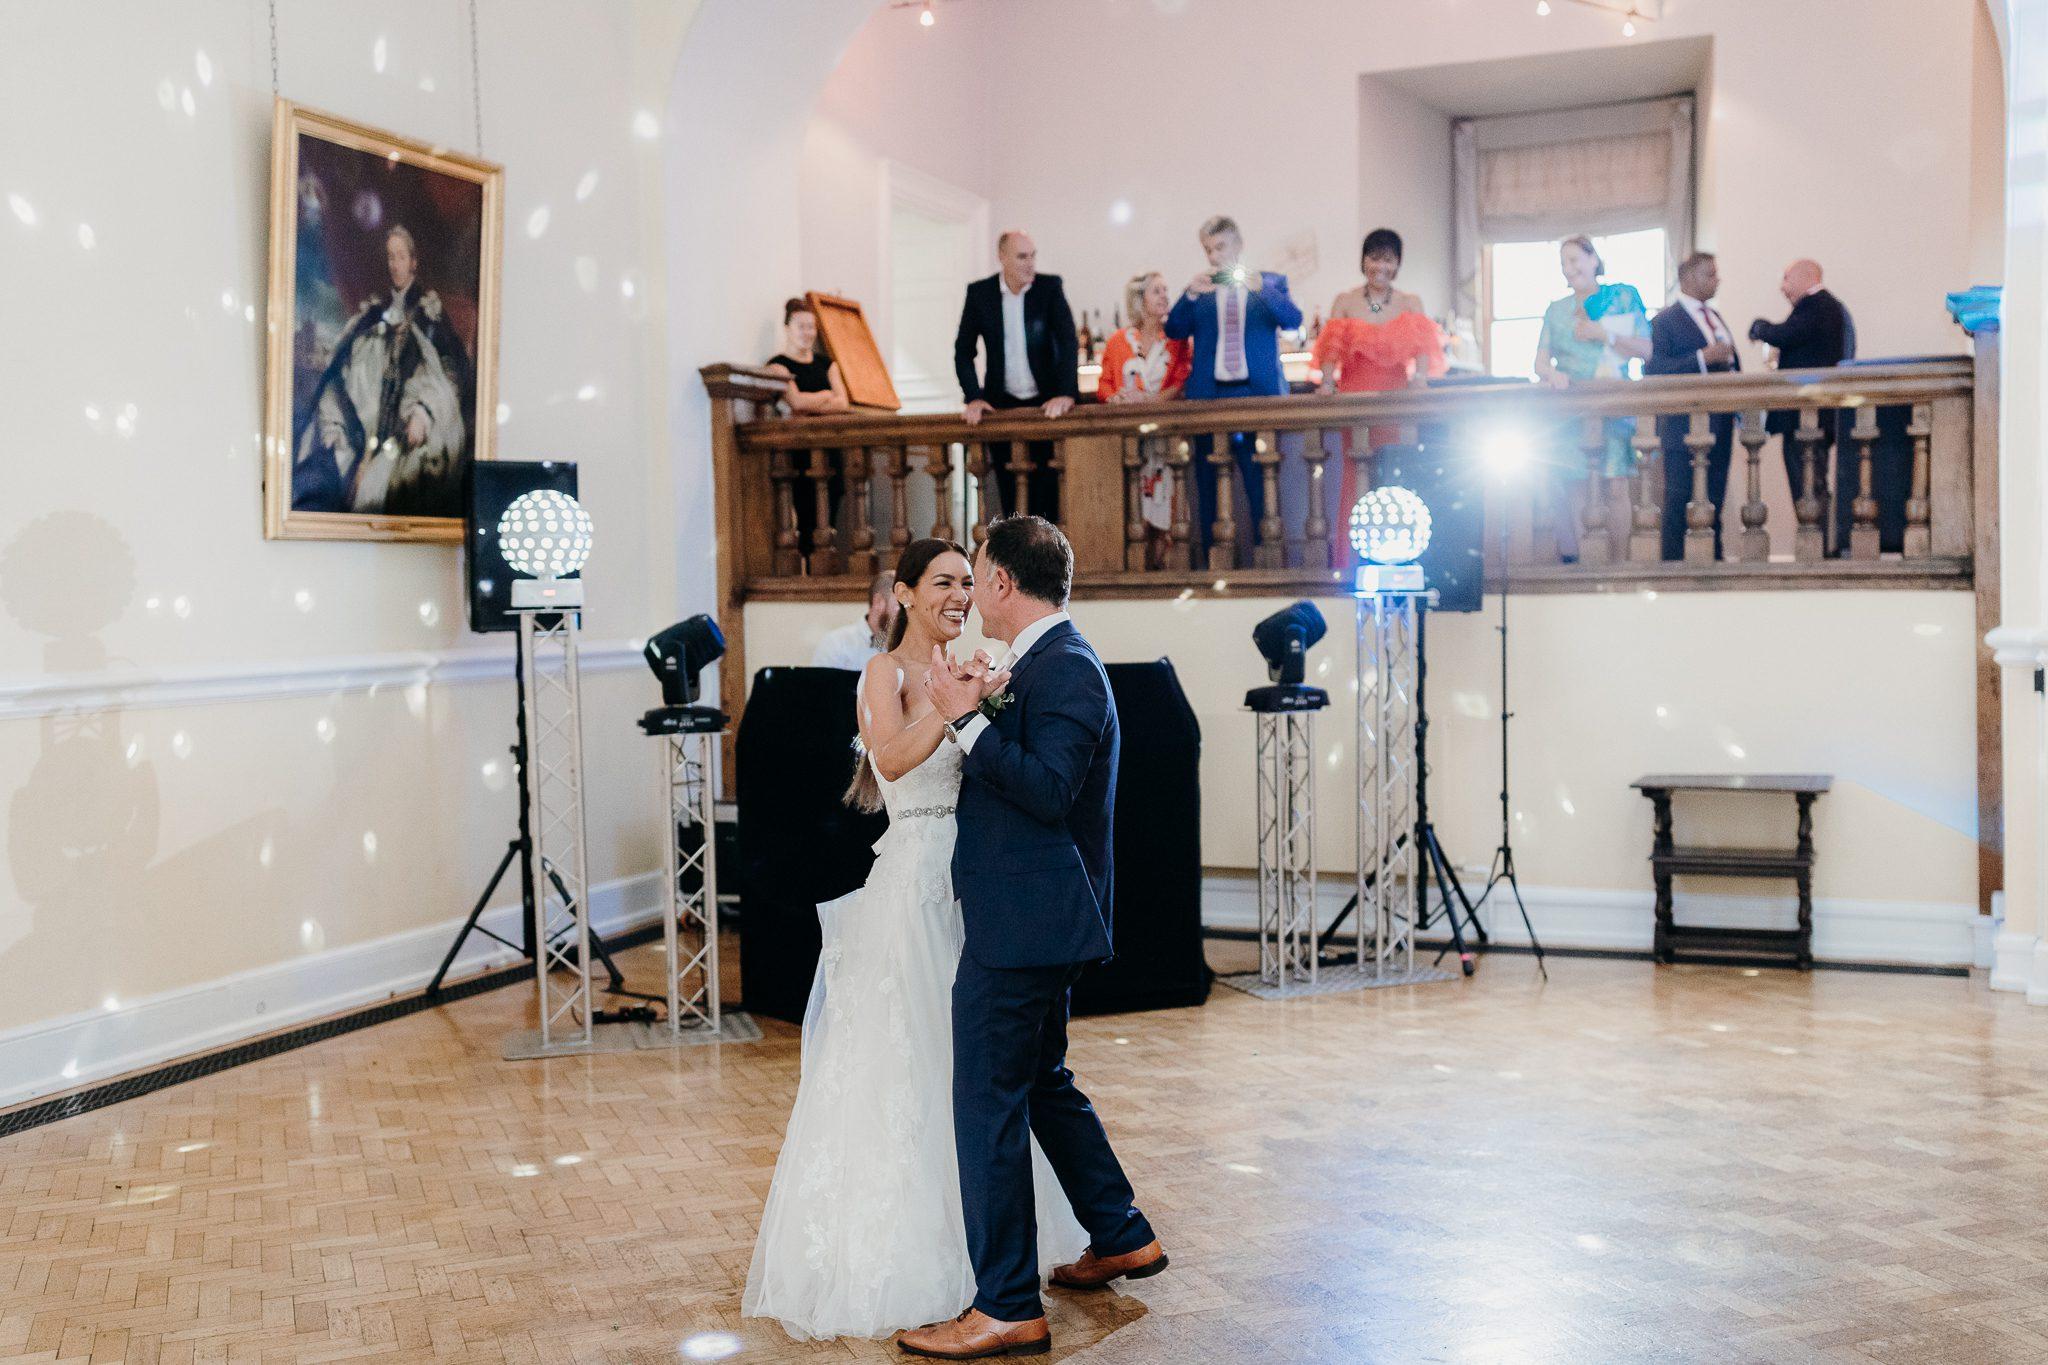 Romantic First Dance at Farnham Castle